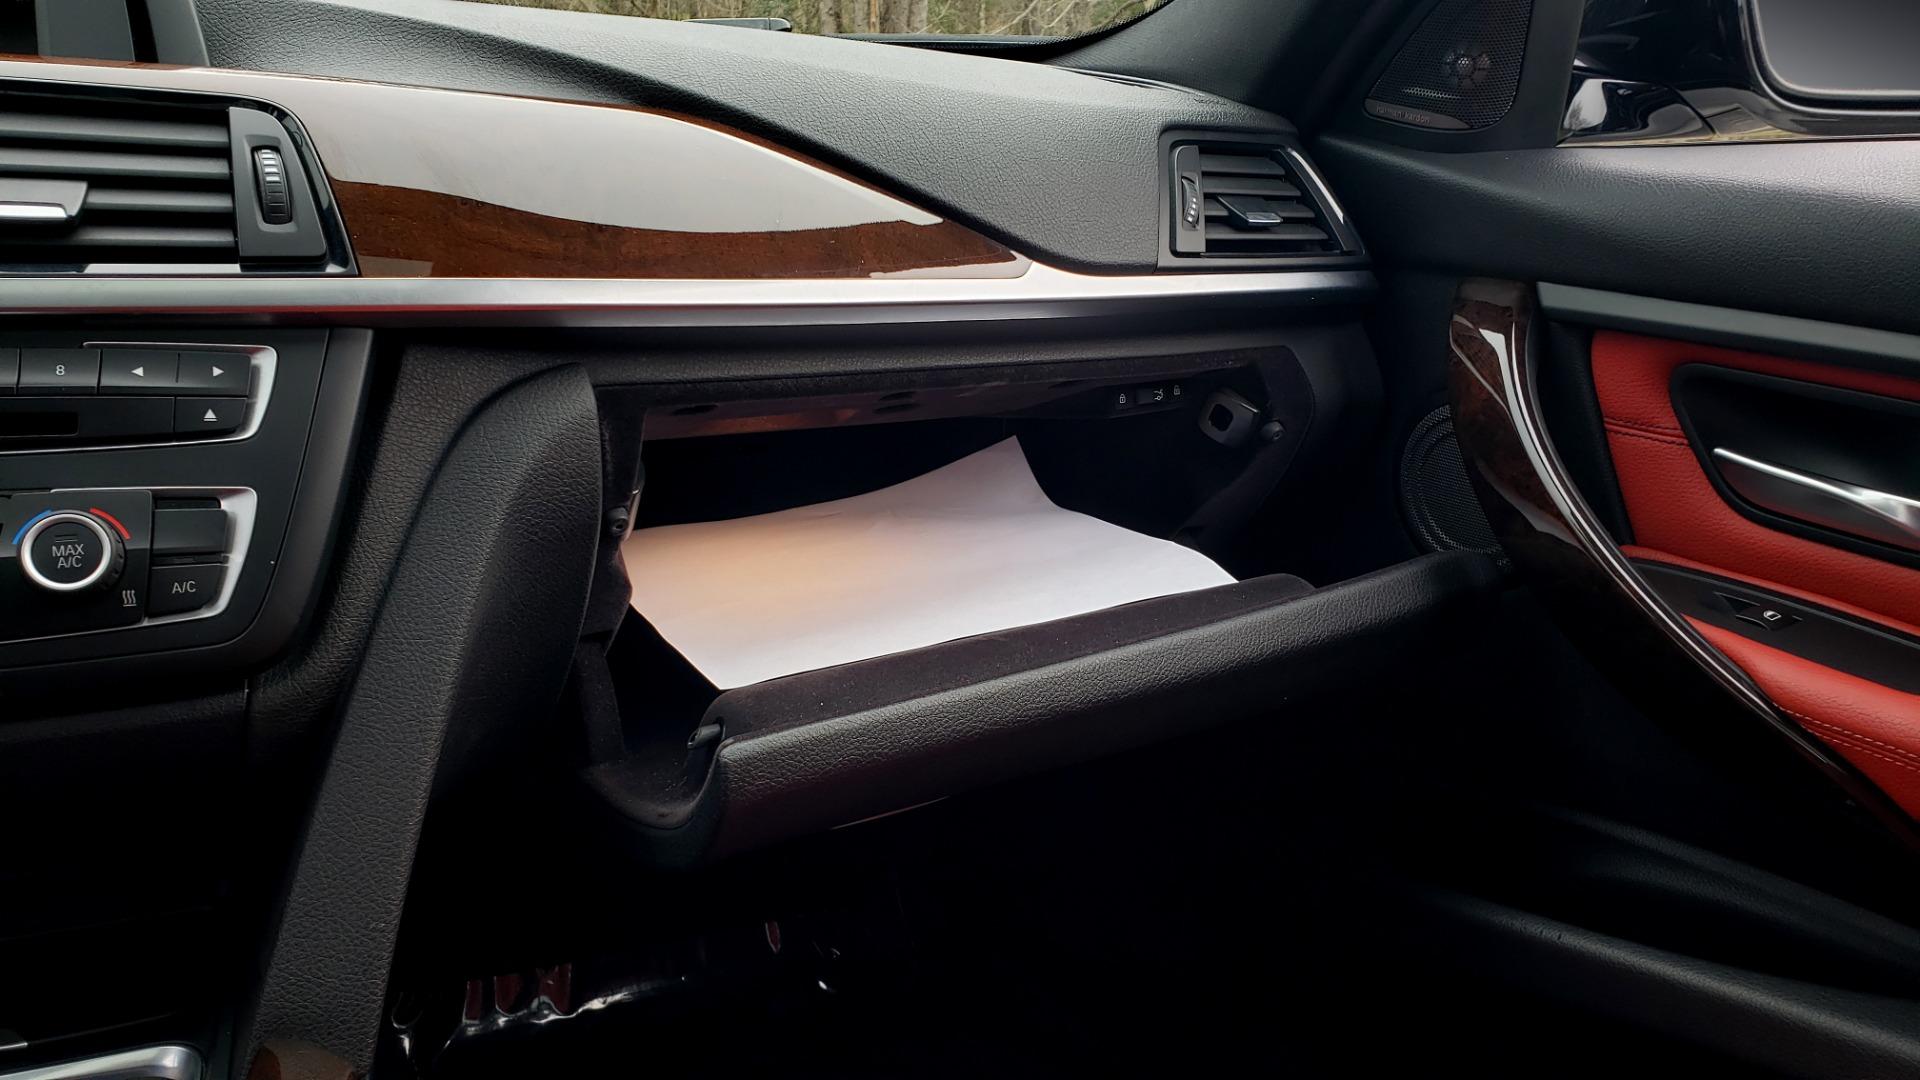 Used 2015 BMW 3 Series 335I M-SPORT / PREM PKG / HK SND / SUNROOF / REARVIEW for sale Sold at Formula Imports in Charlotte NC 28227 52